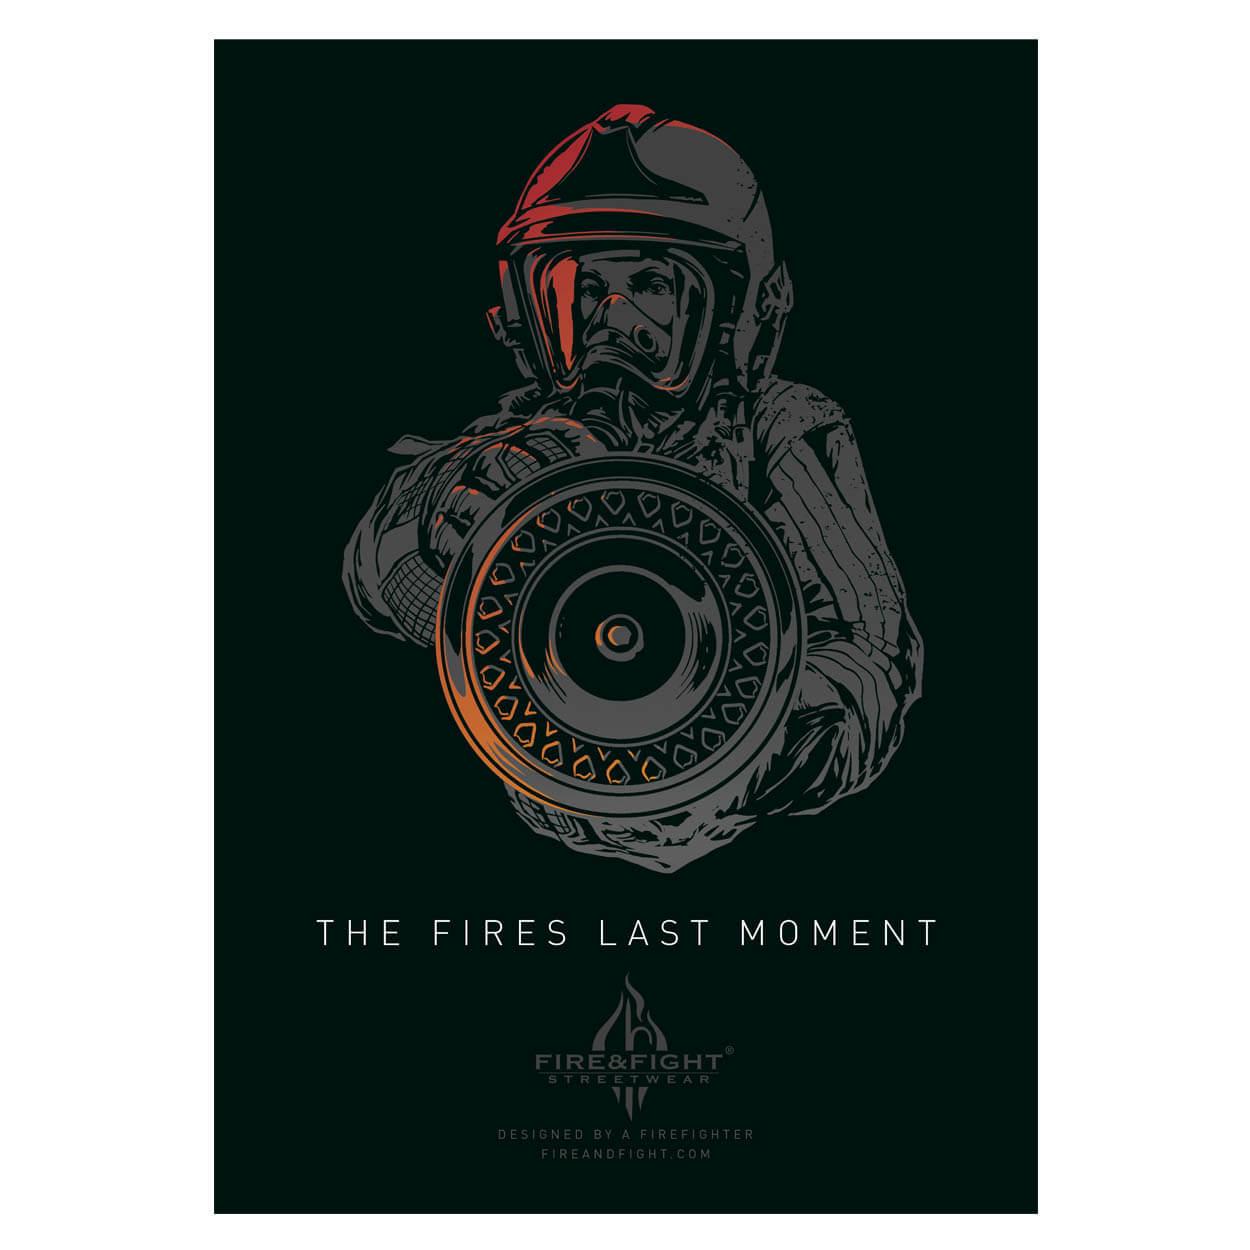 The Fires last Moment - Wandbild Feuerwehrposter 100 x 70 cm